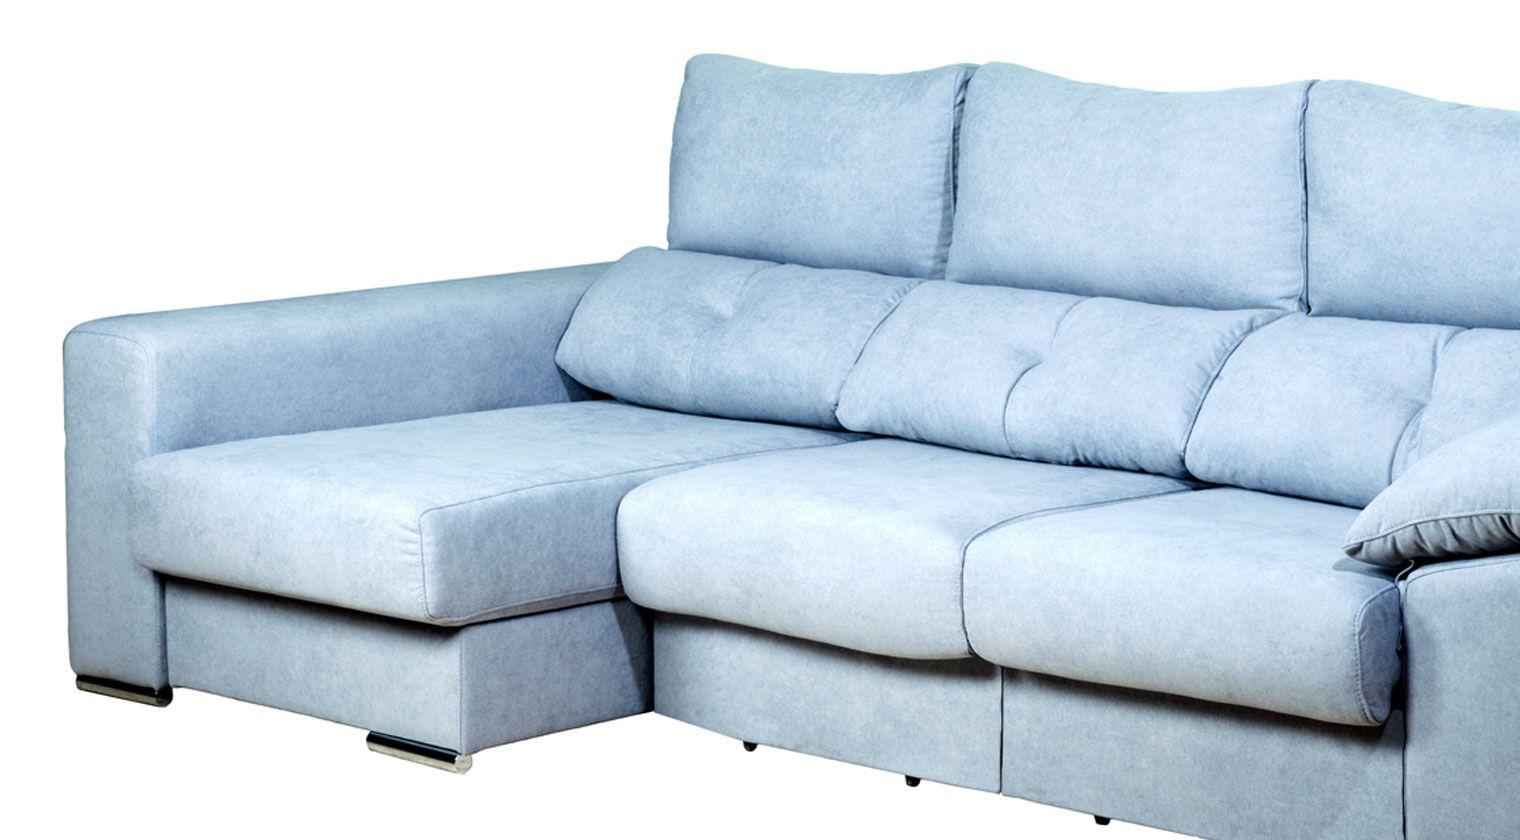 chaise longue tela herm s chaise longue tela On sofas vitello